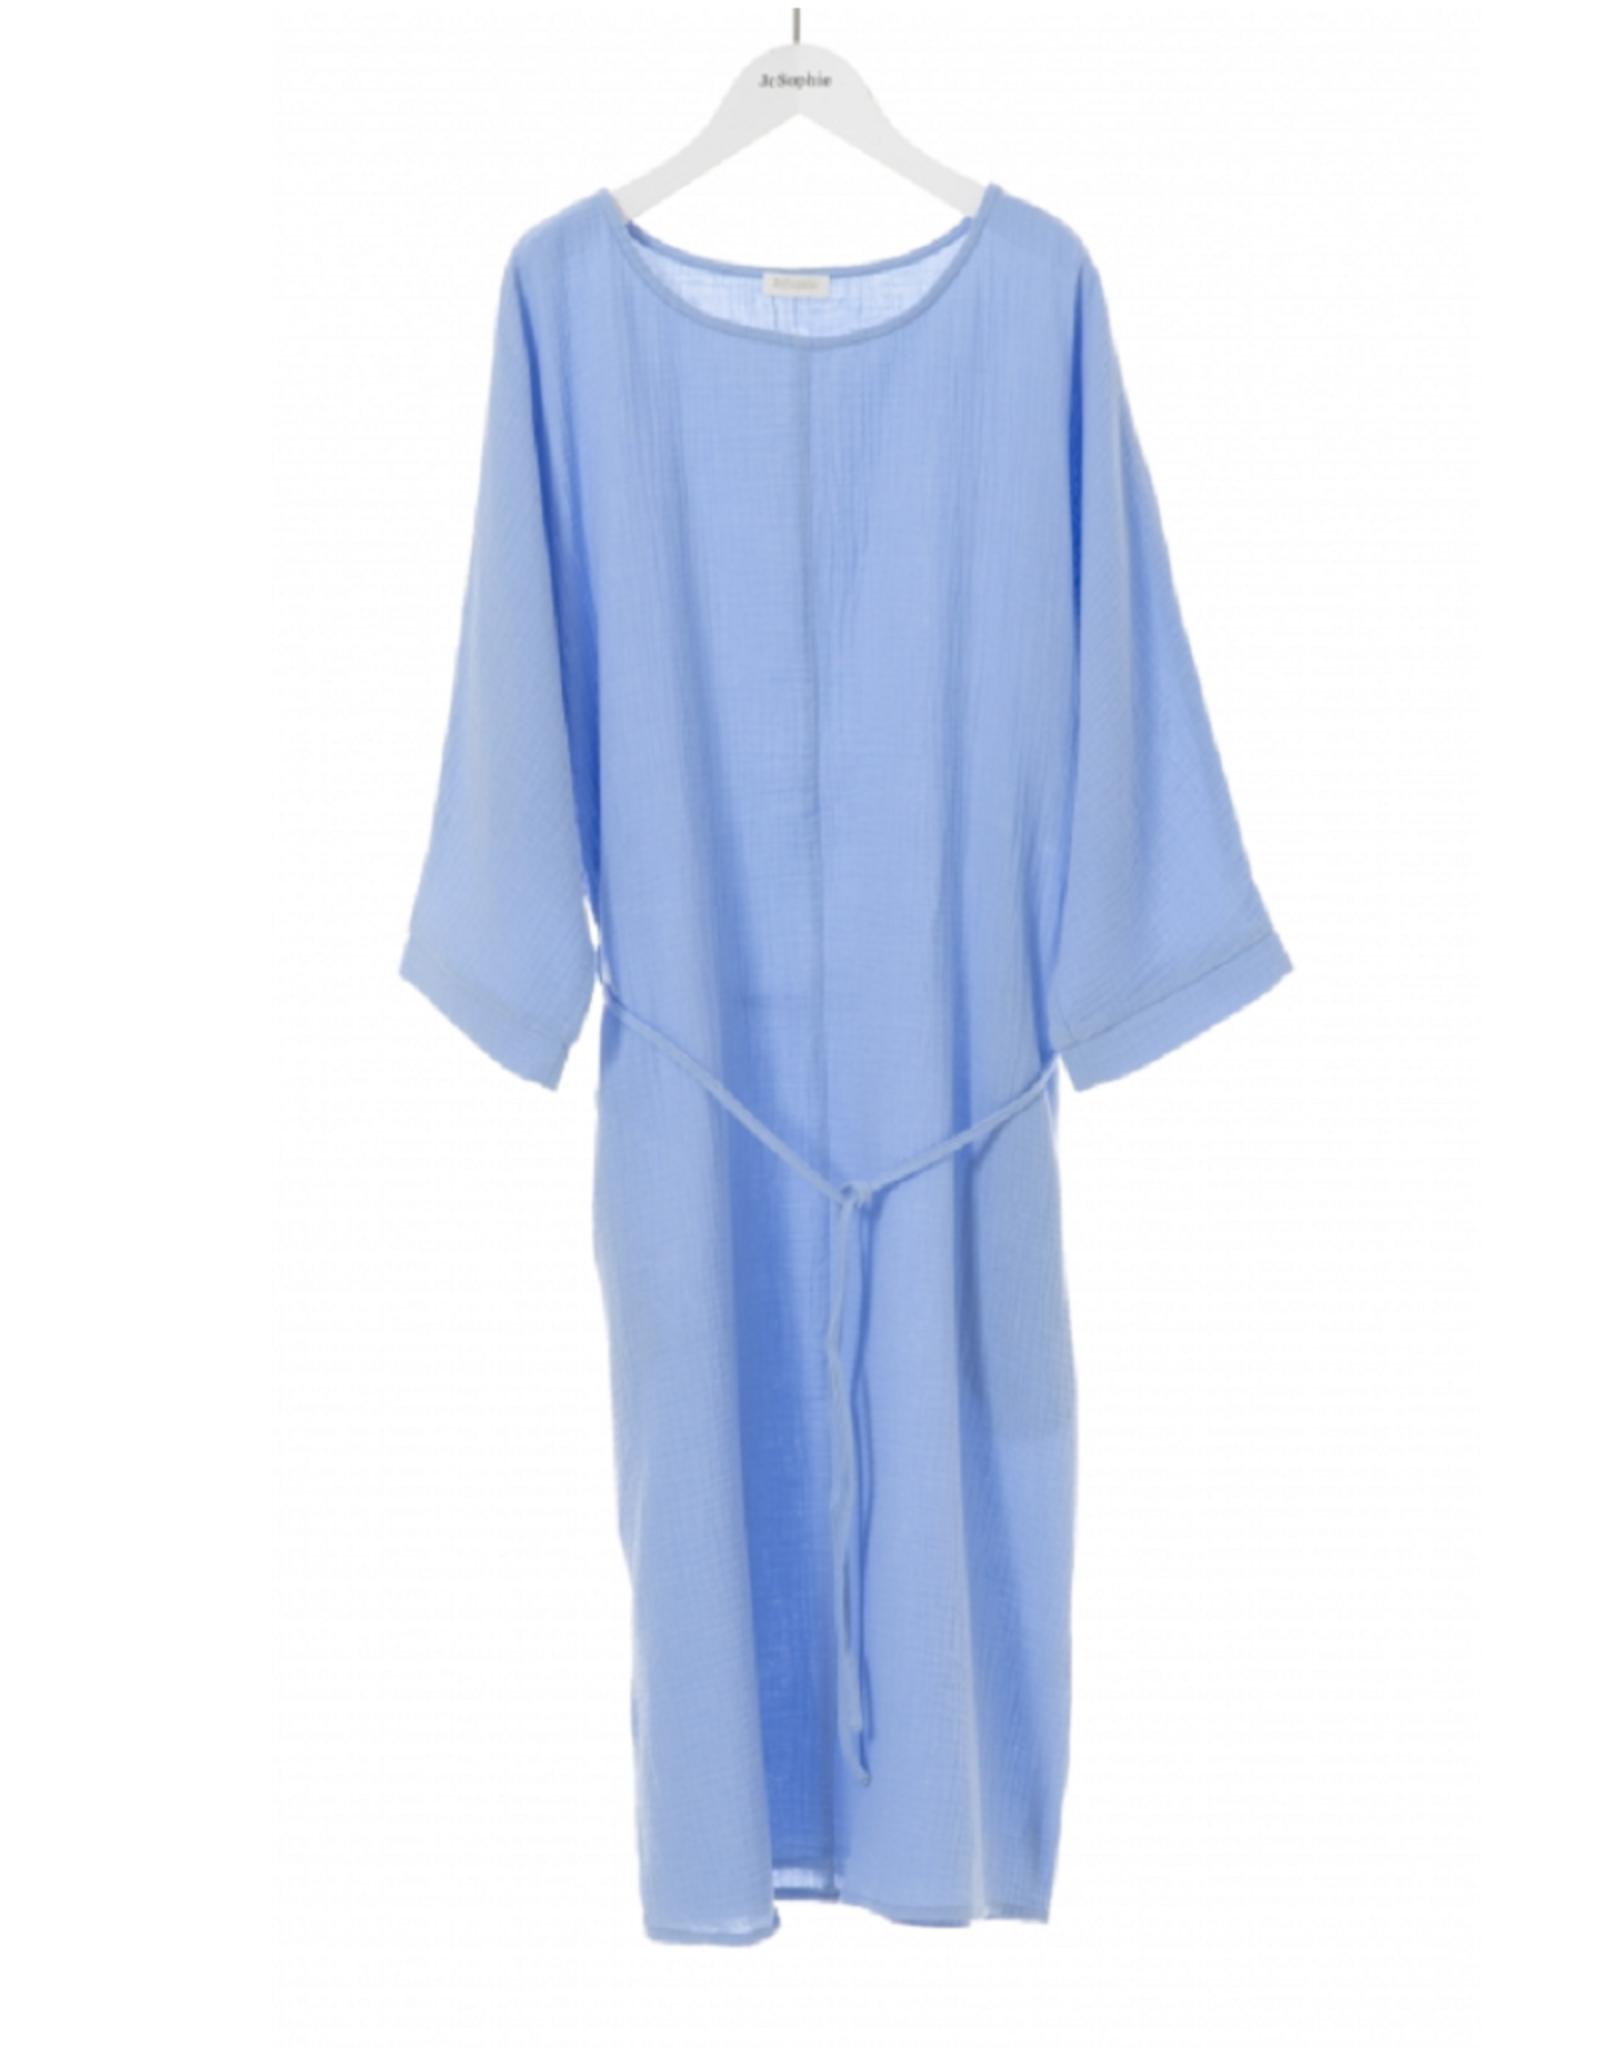 JcSophie JcSophie Graziella dress Sky blue